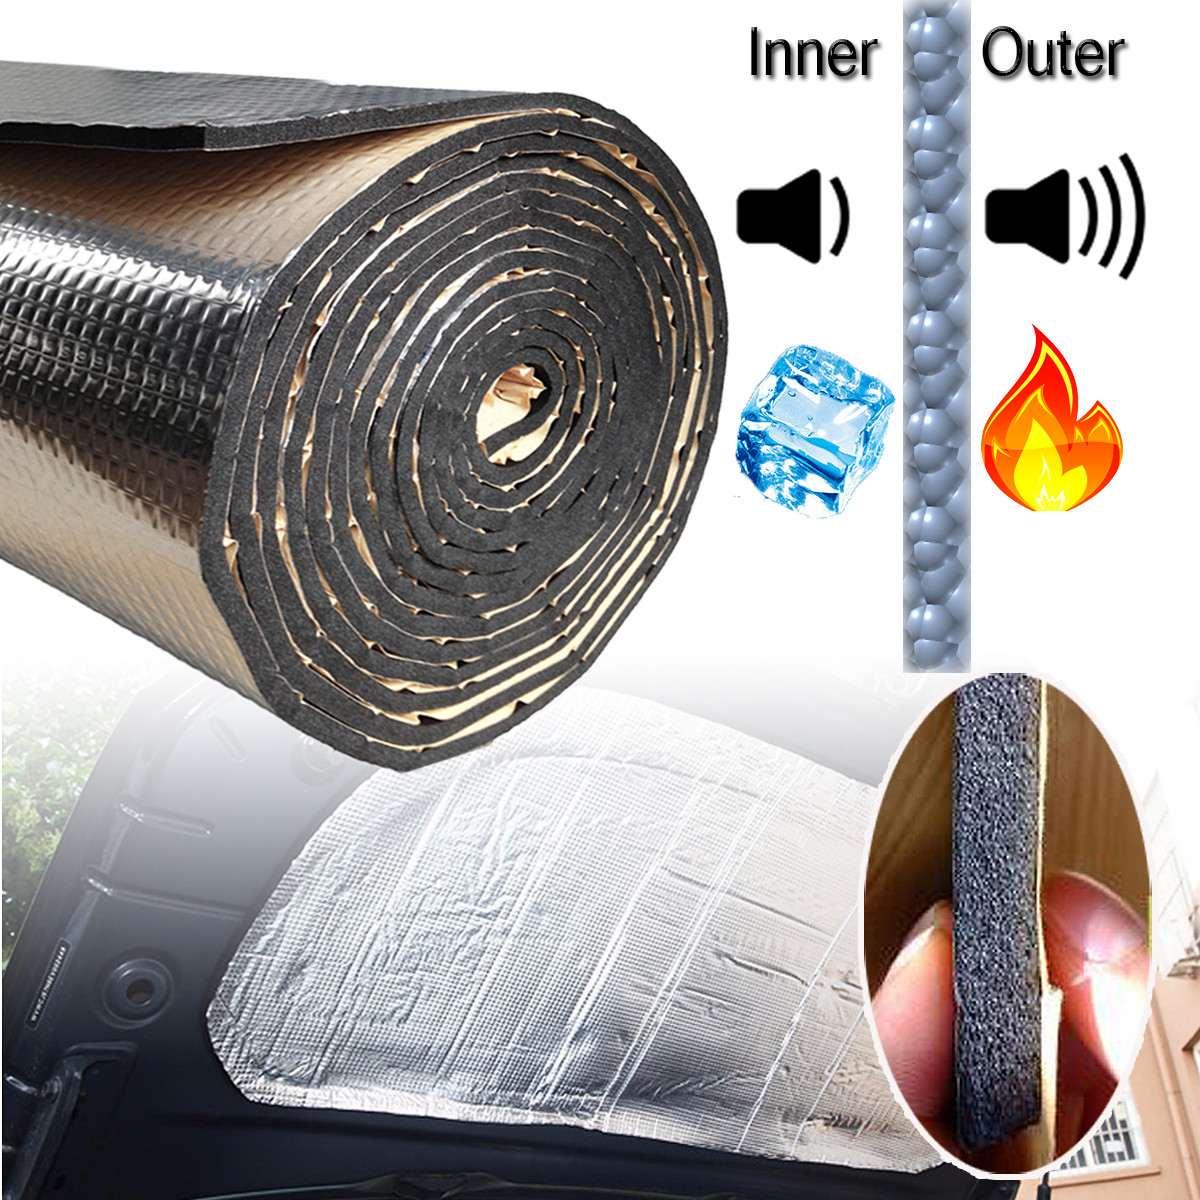 140 cm x 100 cm Auto Haube Motor Firewall Wärme Matte Deadener Sound Isolierung Trittschalldämmung Material Aluminium Folie Aufkleber